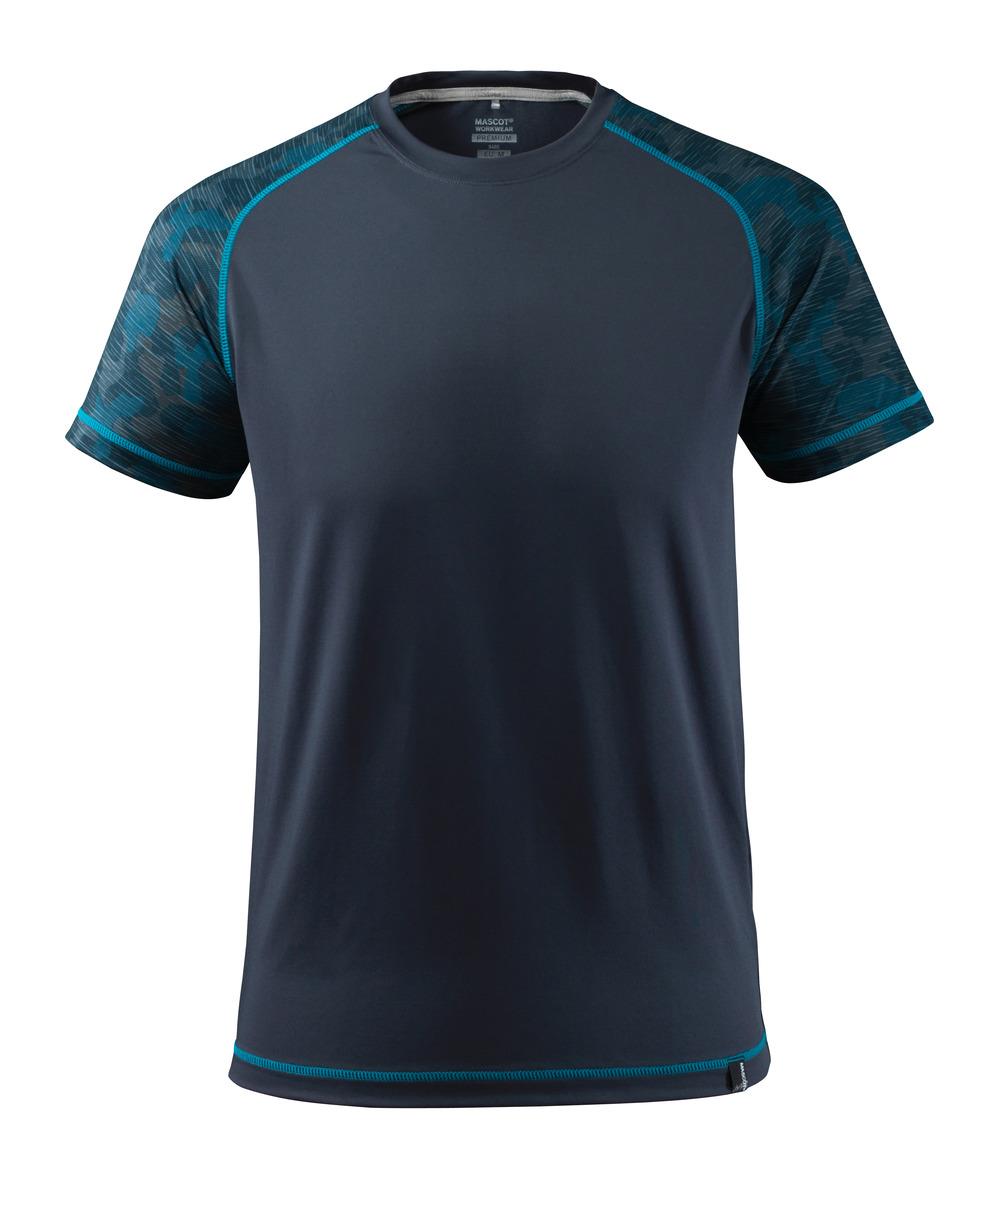 17482-944-010 T-Shirt - ciemny granat